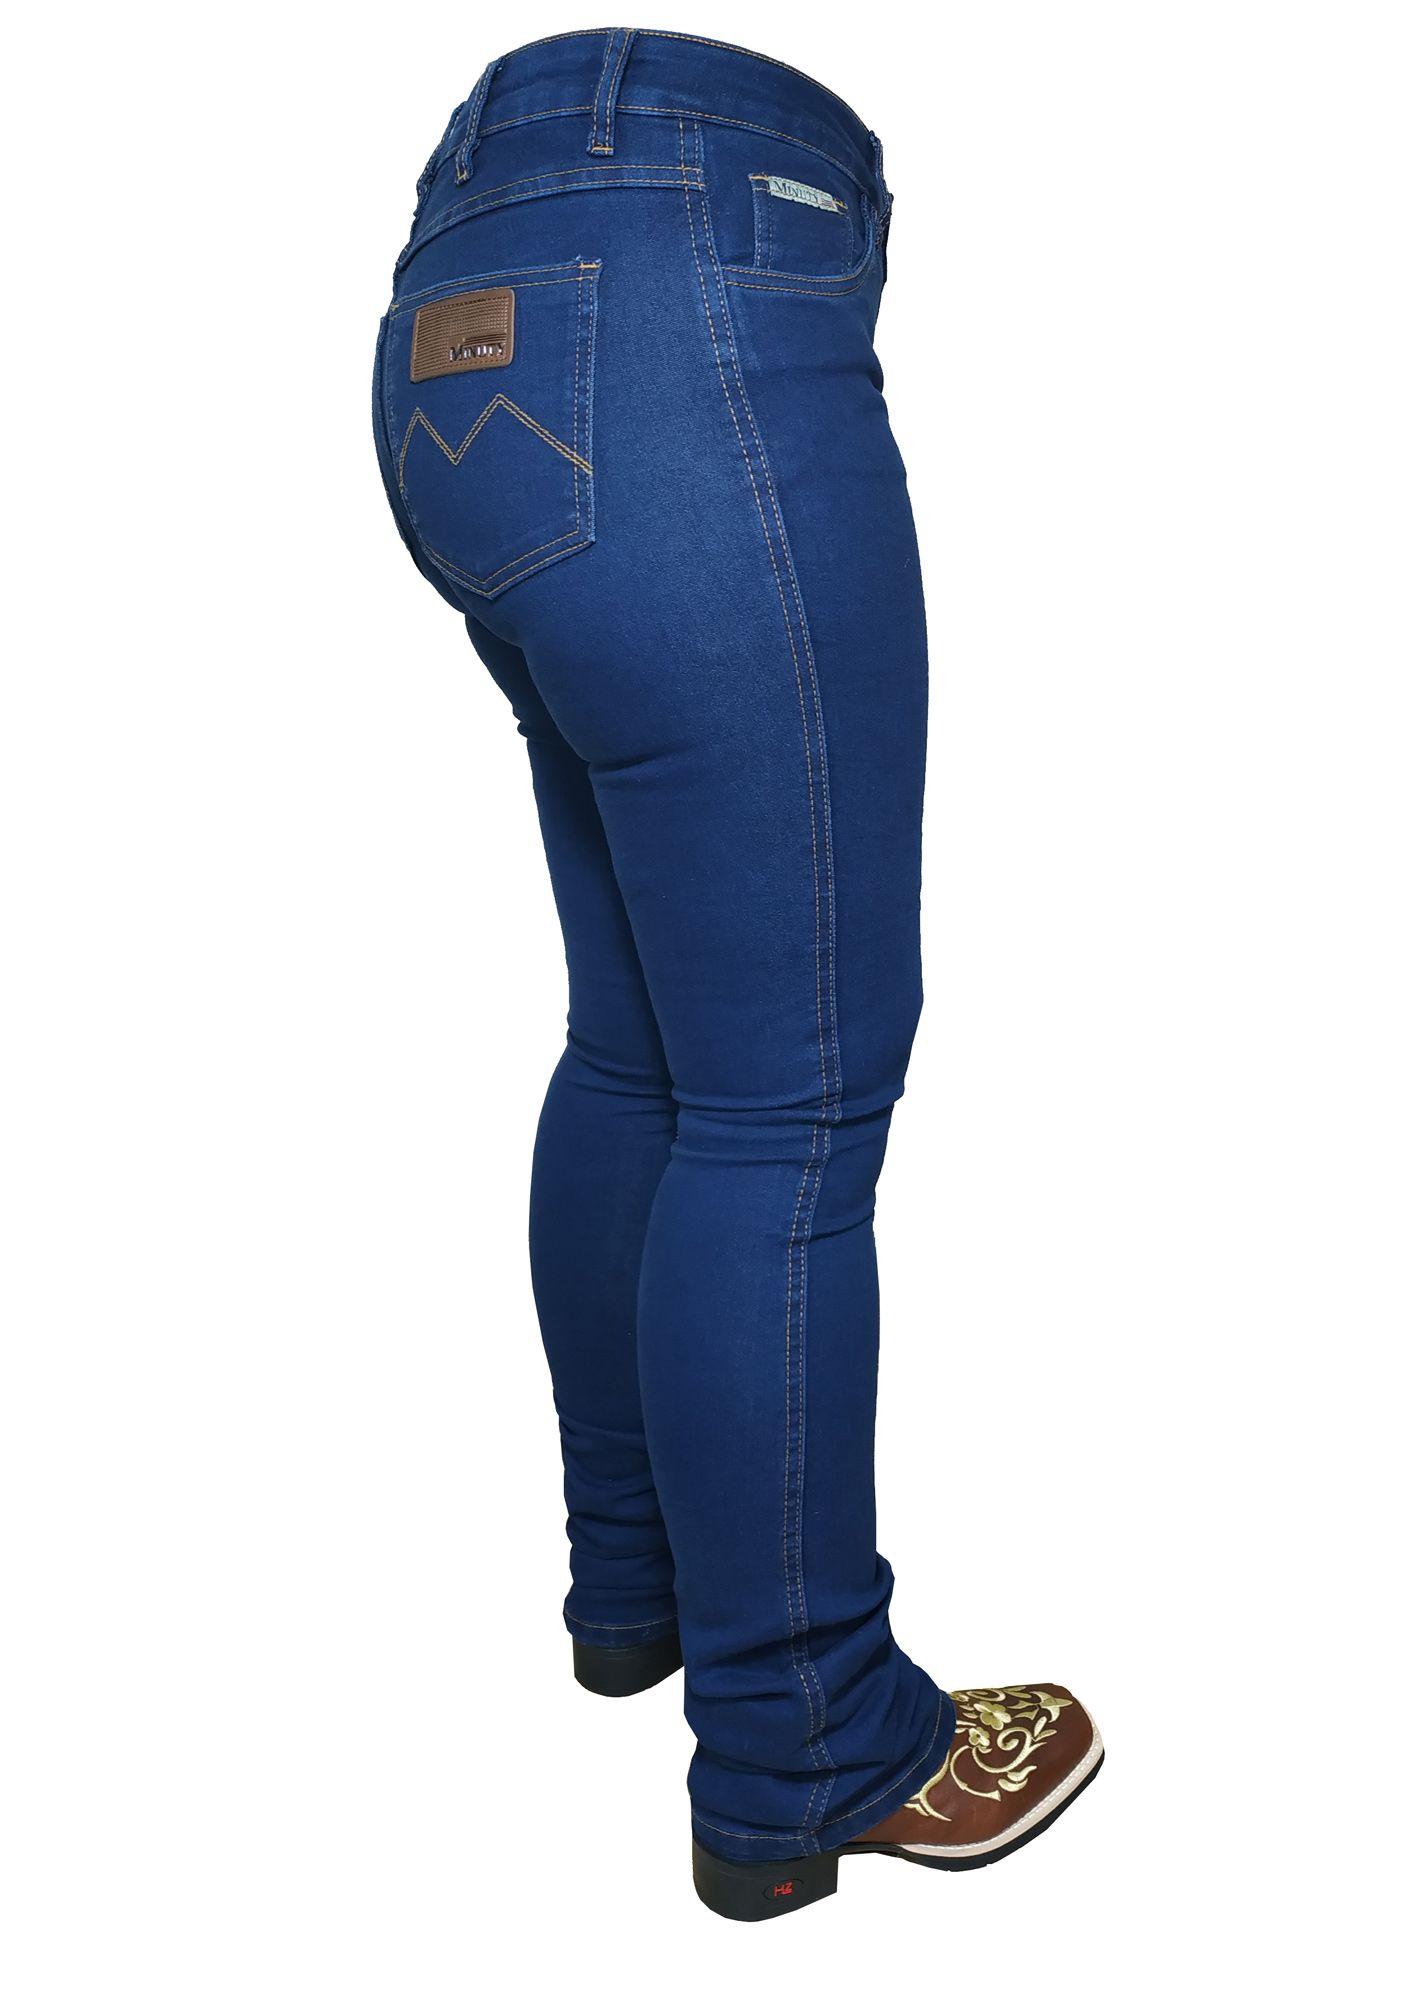 Calça Feminina Minuty Boot Cut Ref 95035